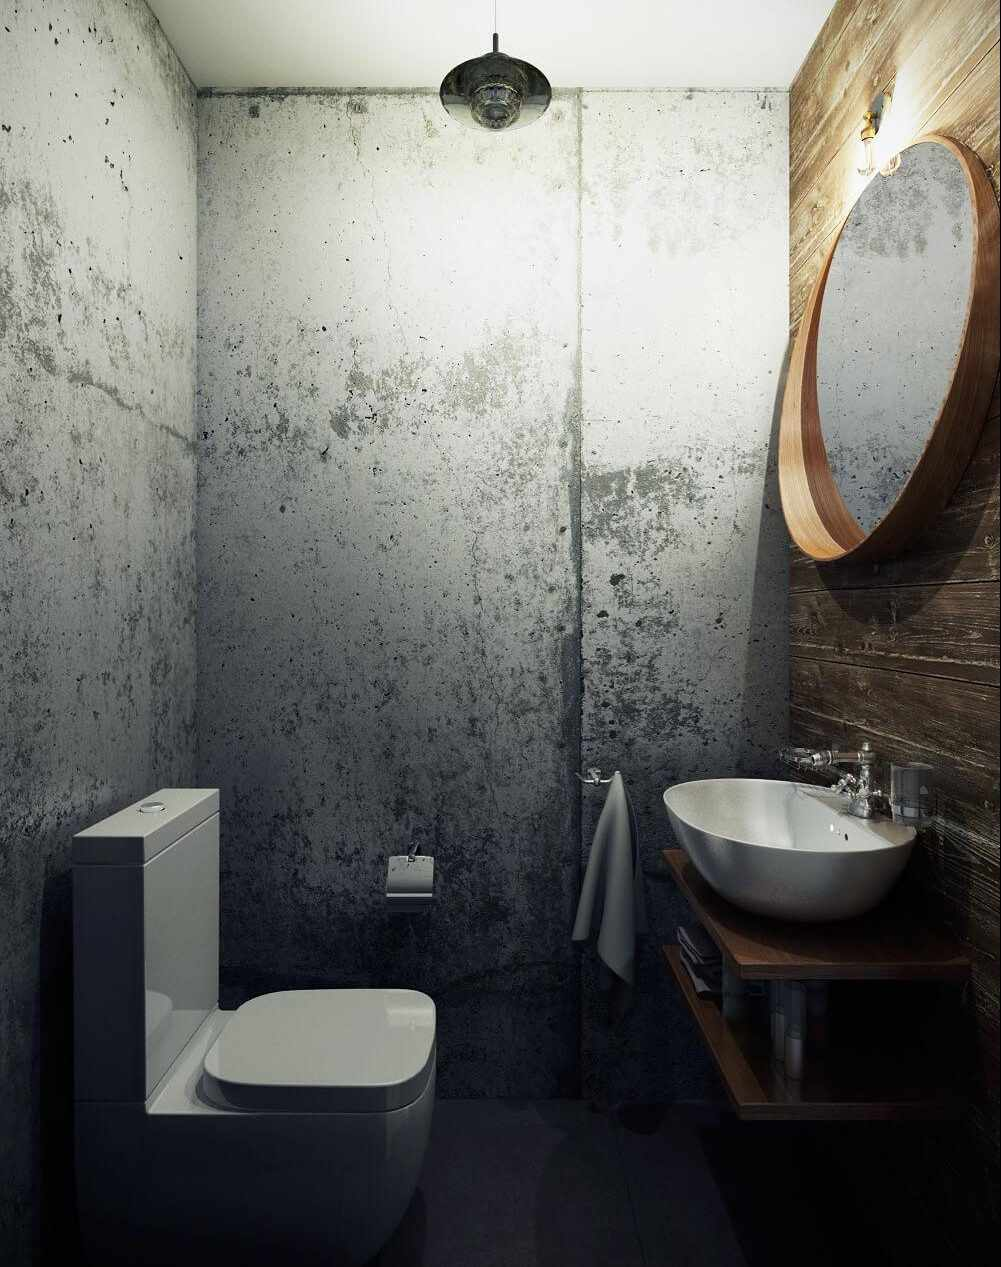 Стиль лофт в дизайне туалета